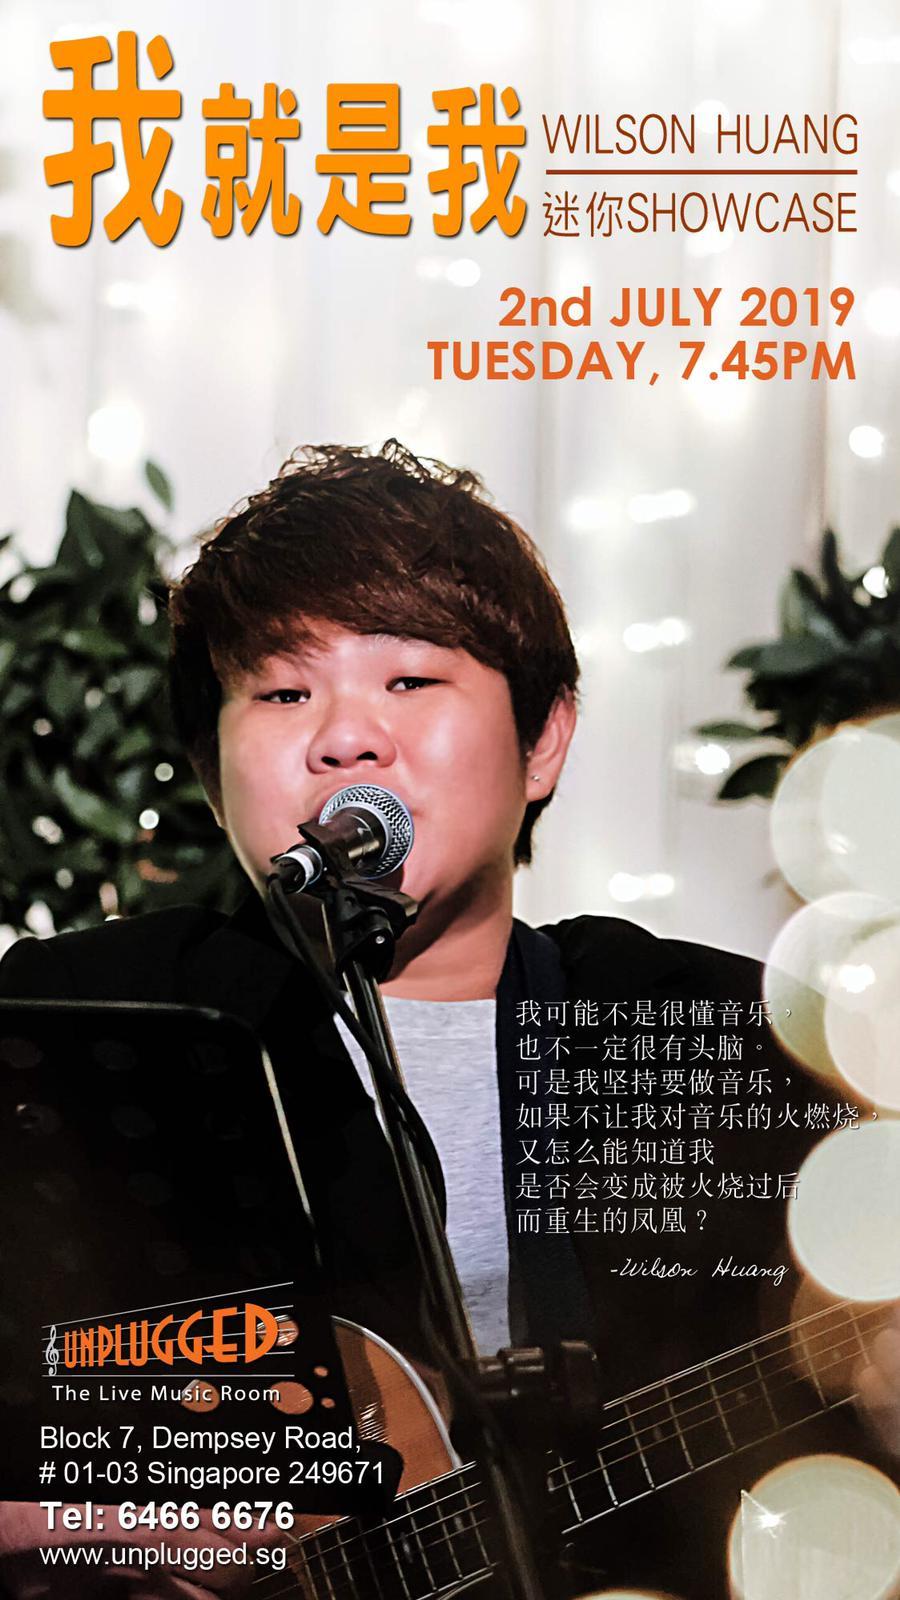 wilson_huang_mini_showcase